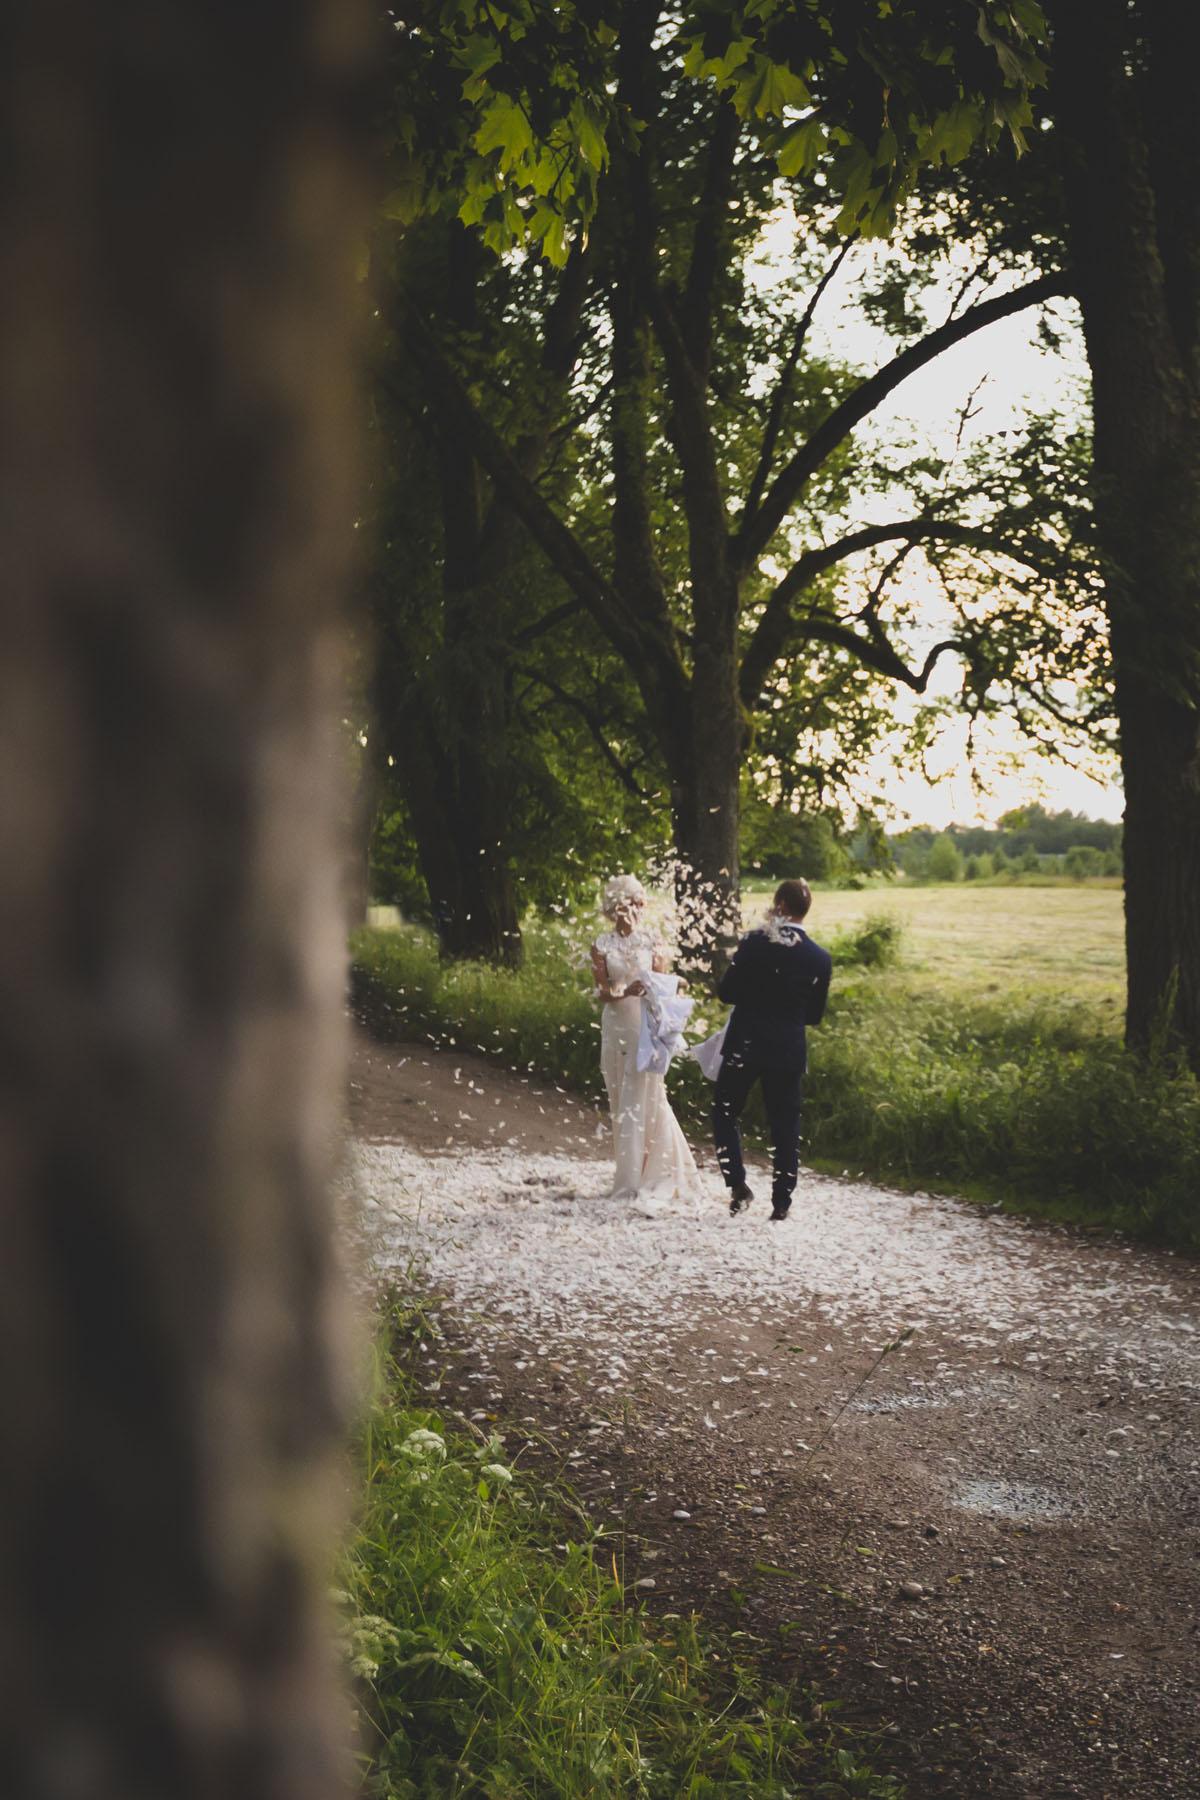 wedding-photos-144-taagepera-wedding-photographer.jpg